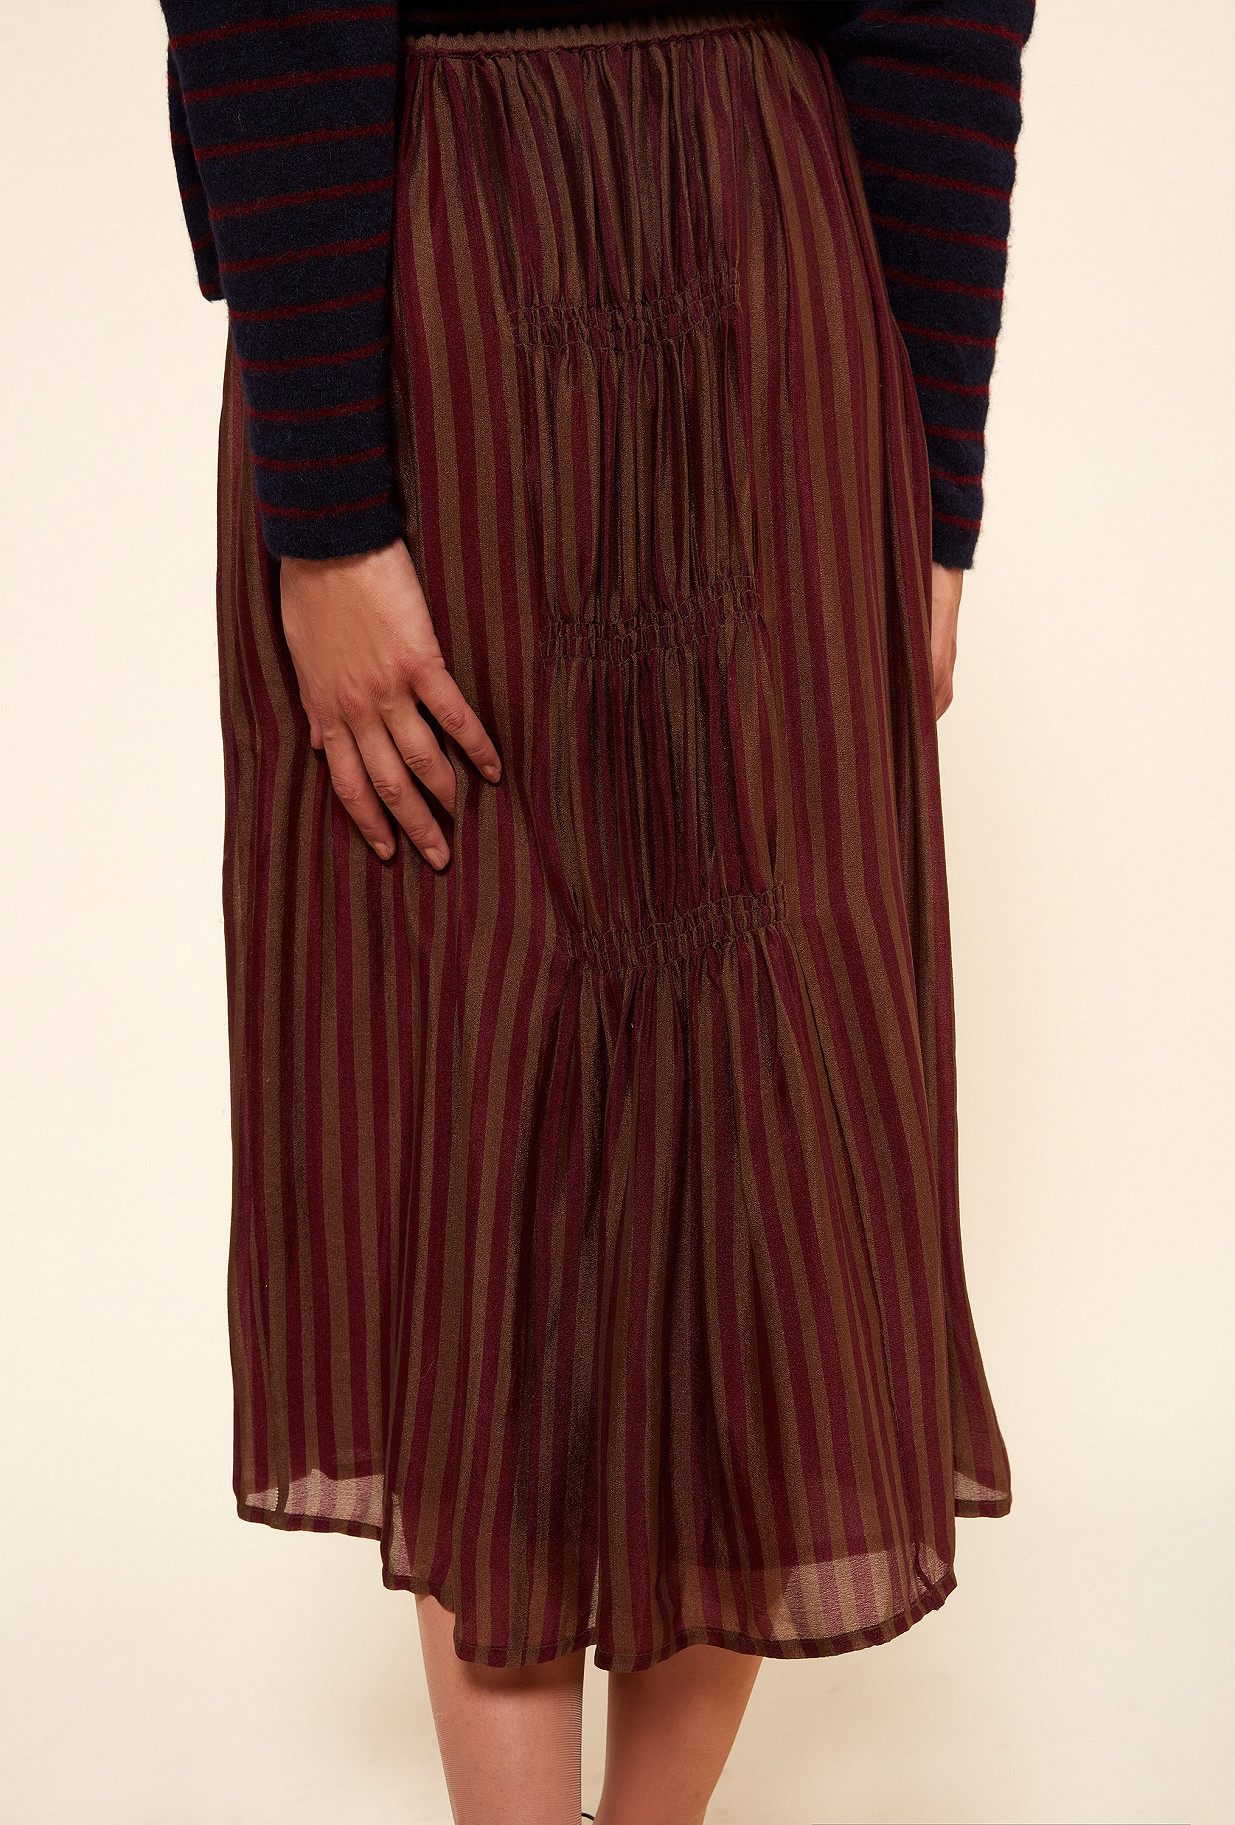 Paris clothes store Skirt  Chaton french designer fashion Paris